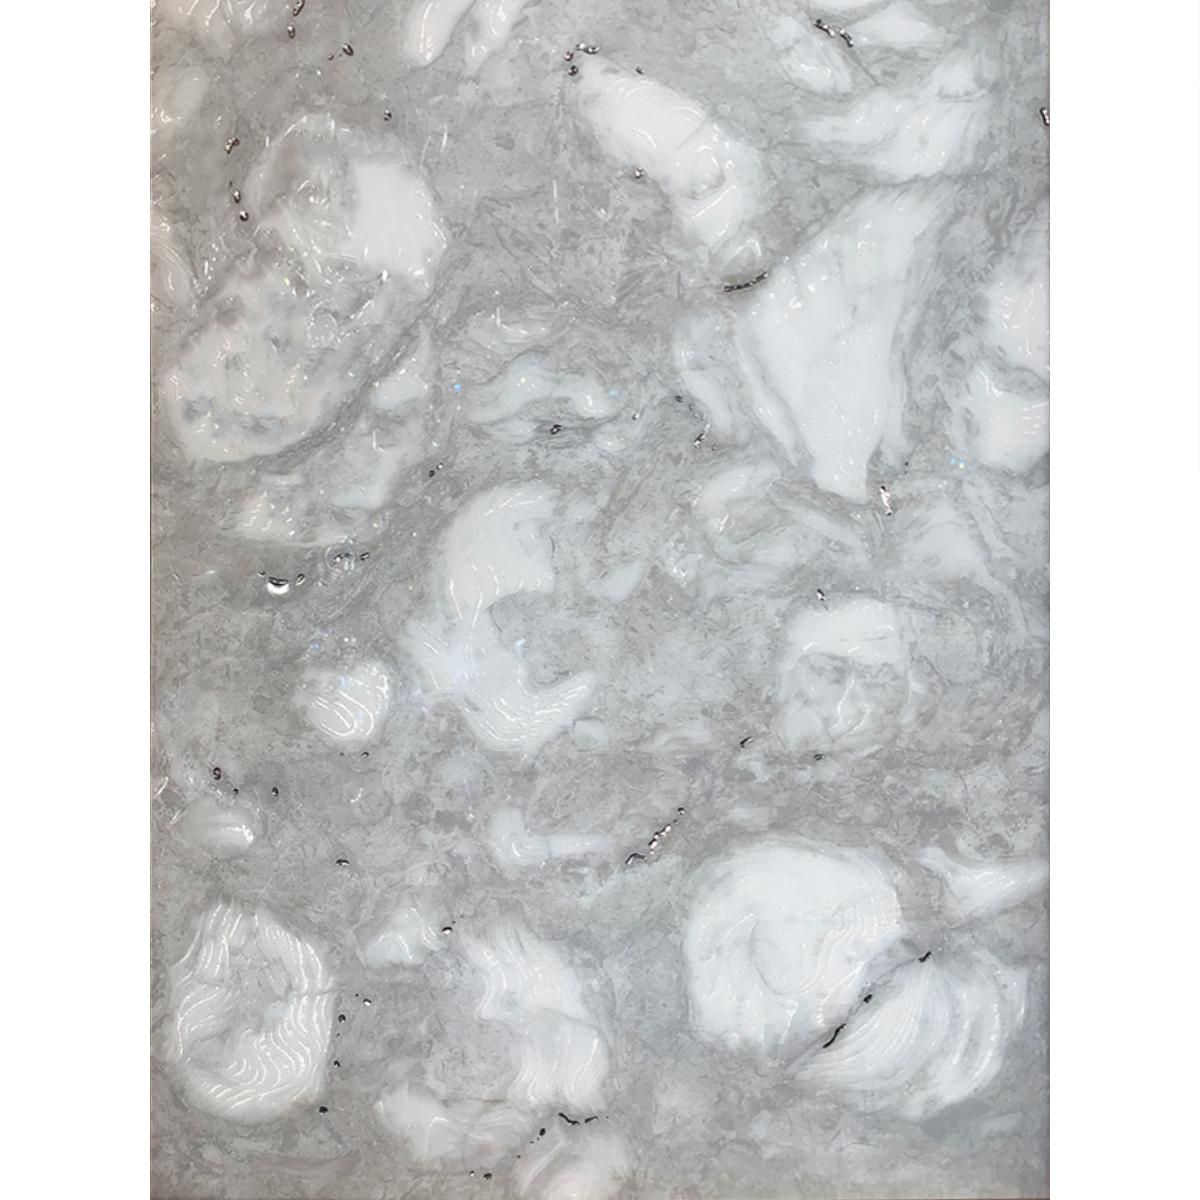 D00172 VERSUS PEARL WHITE